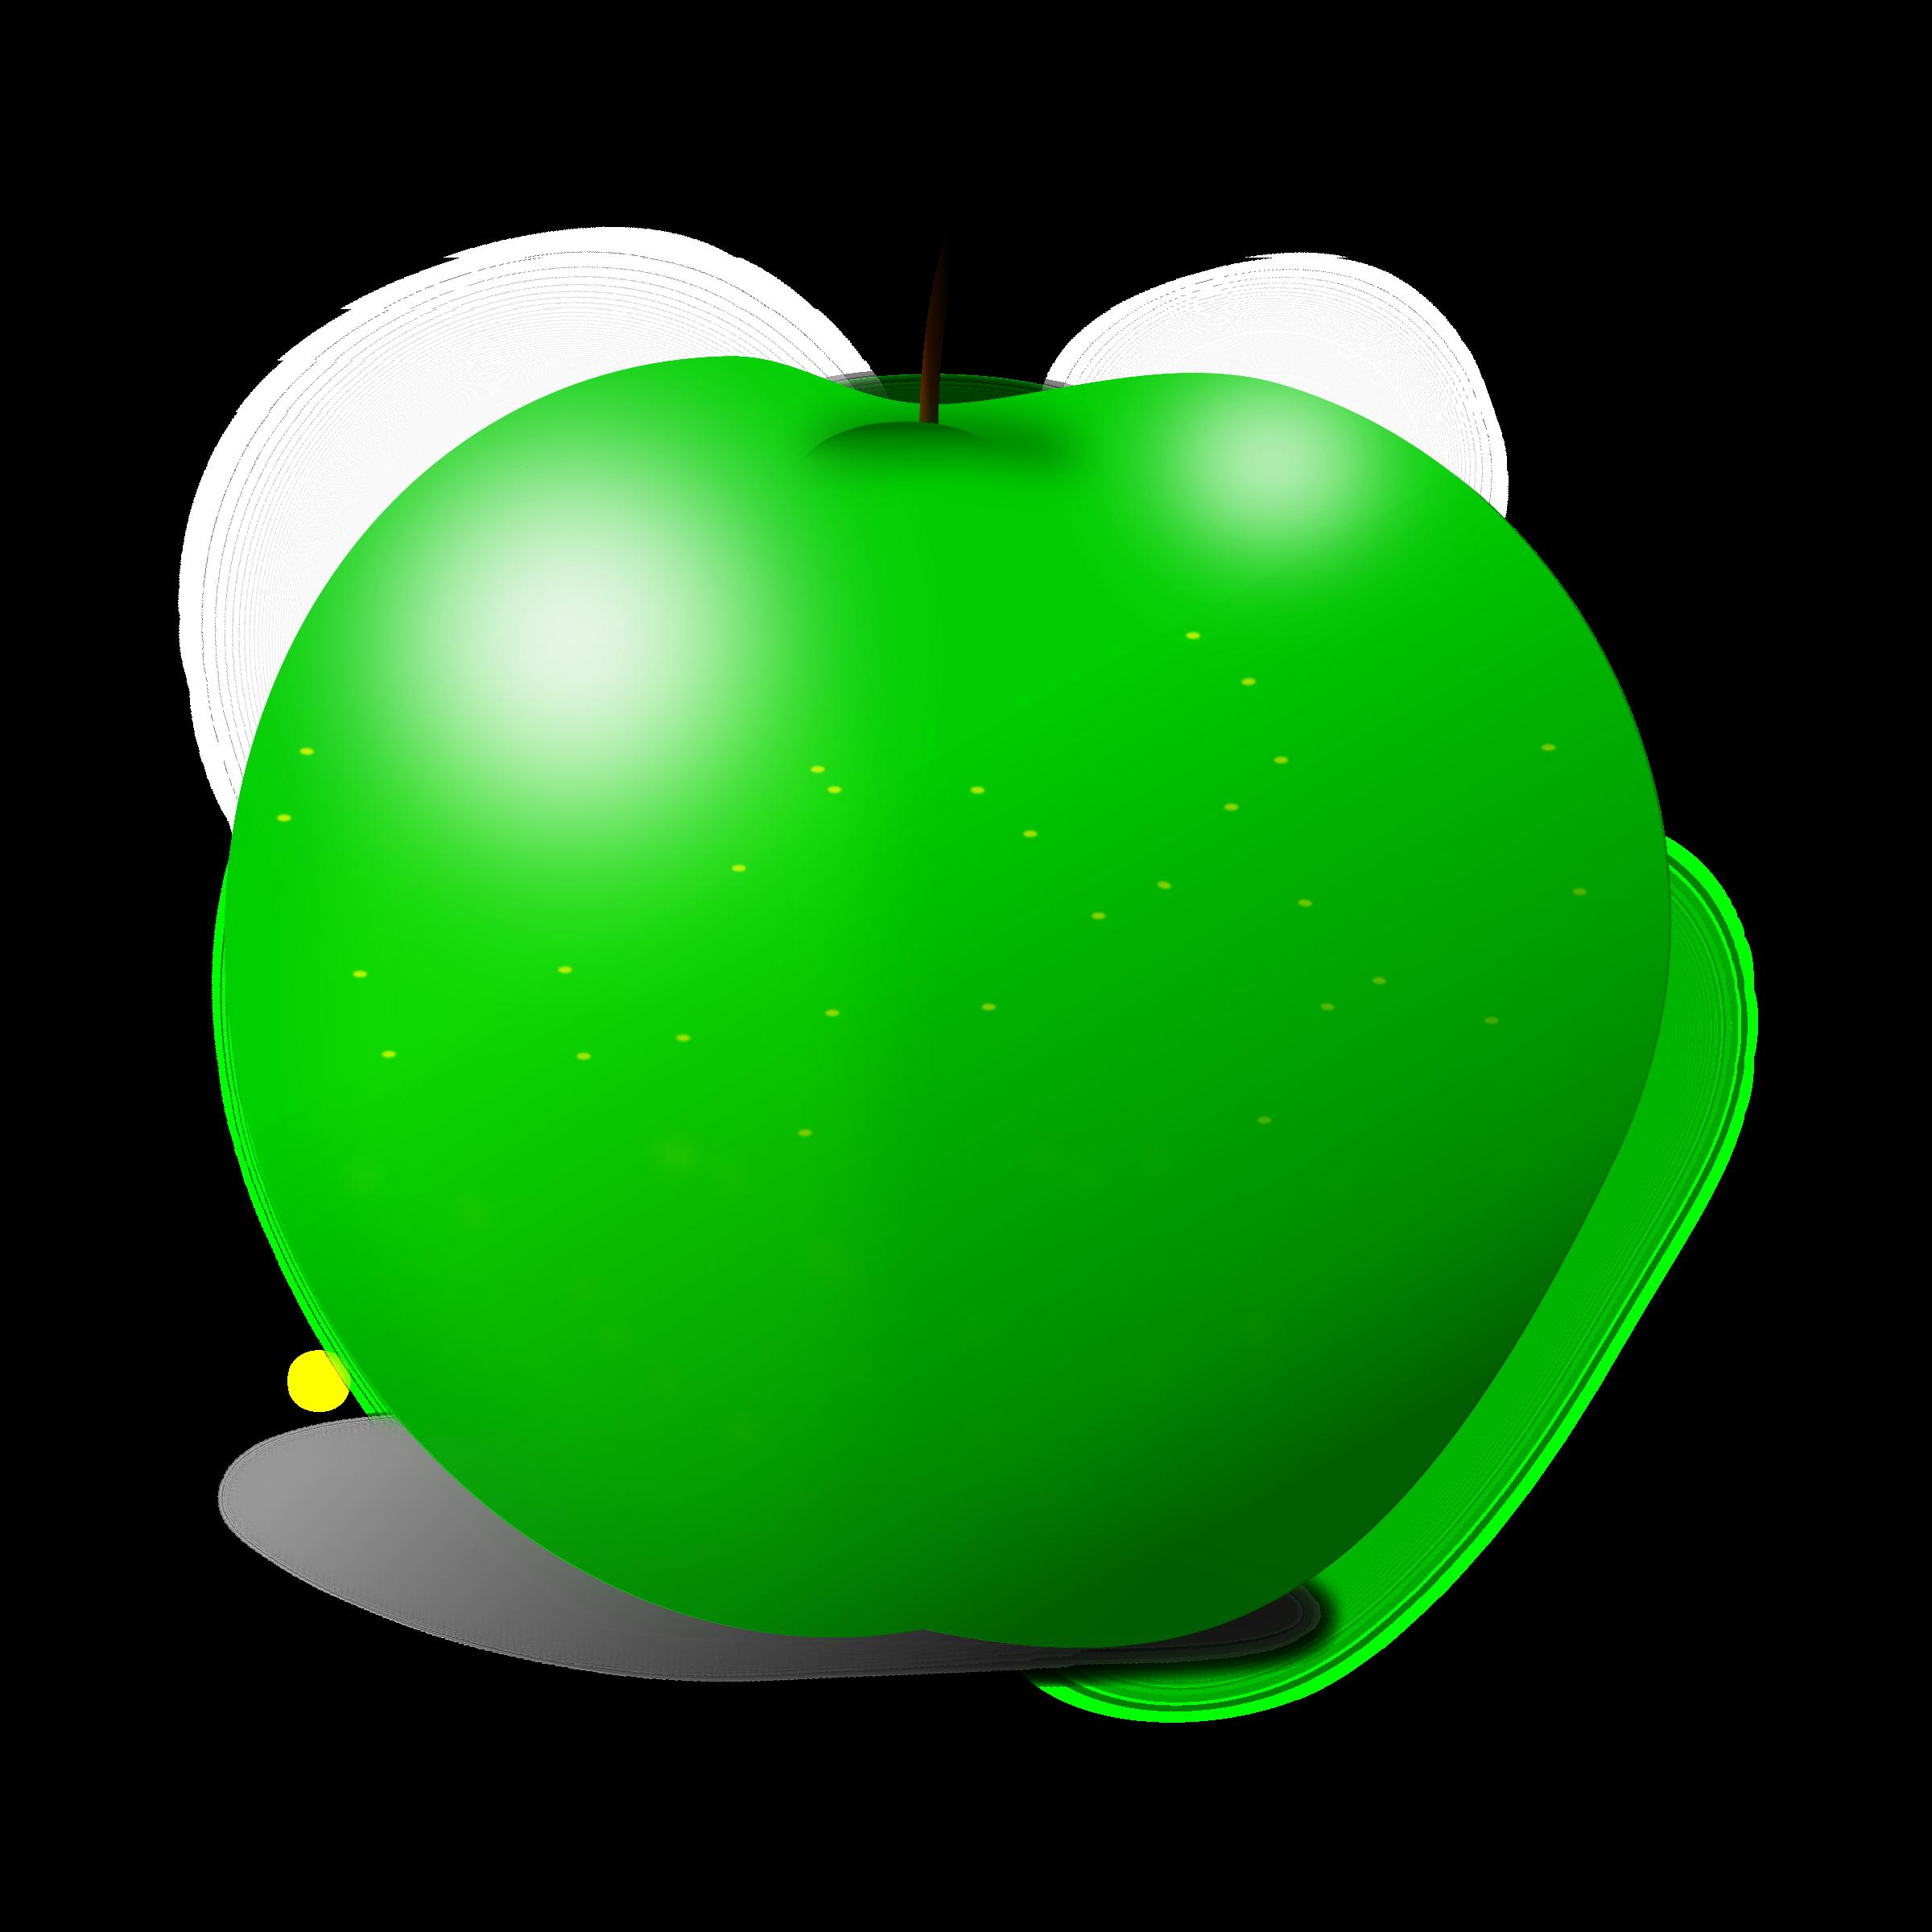 Granny smith apple tree clipart vector black and white download Clipart - Apple vector black and white download